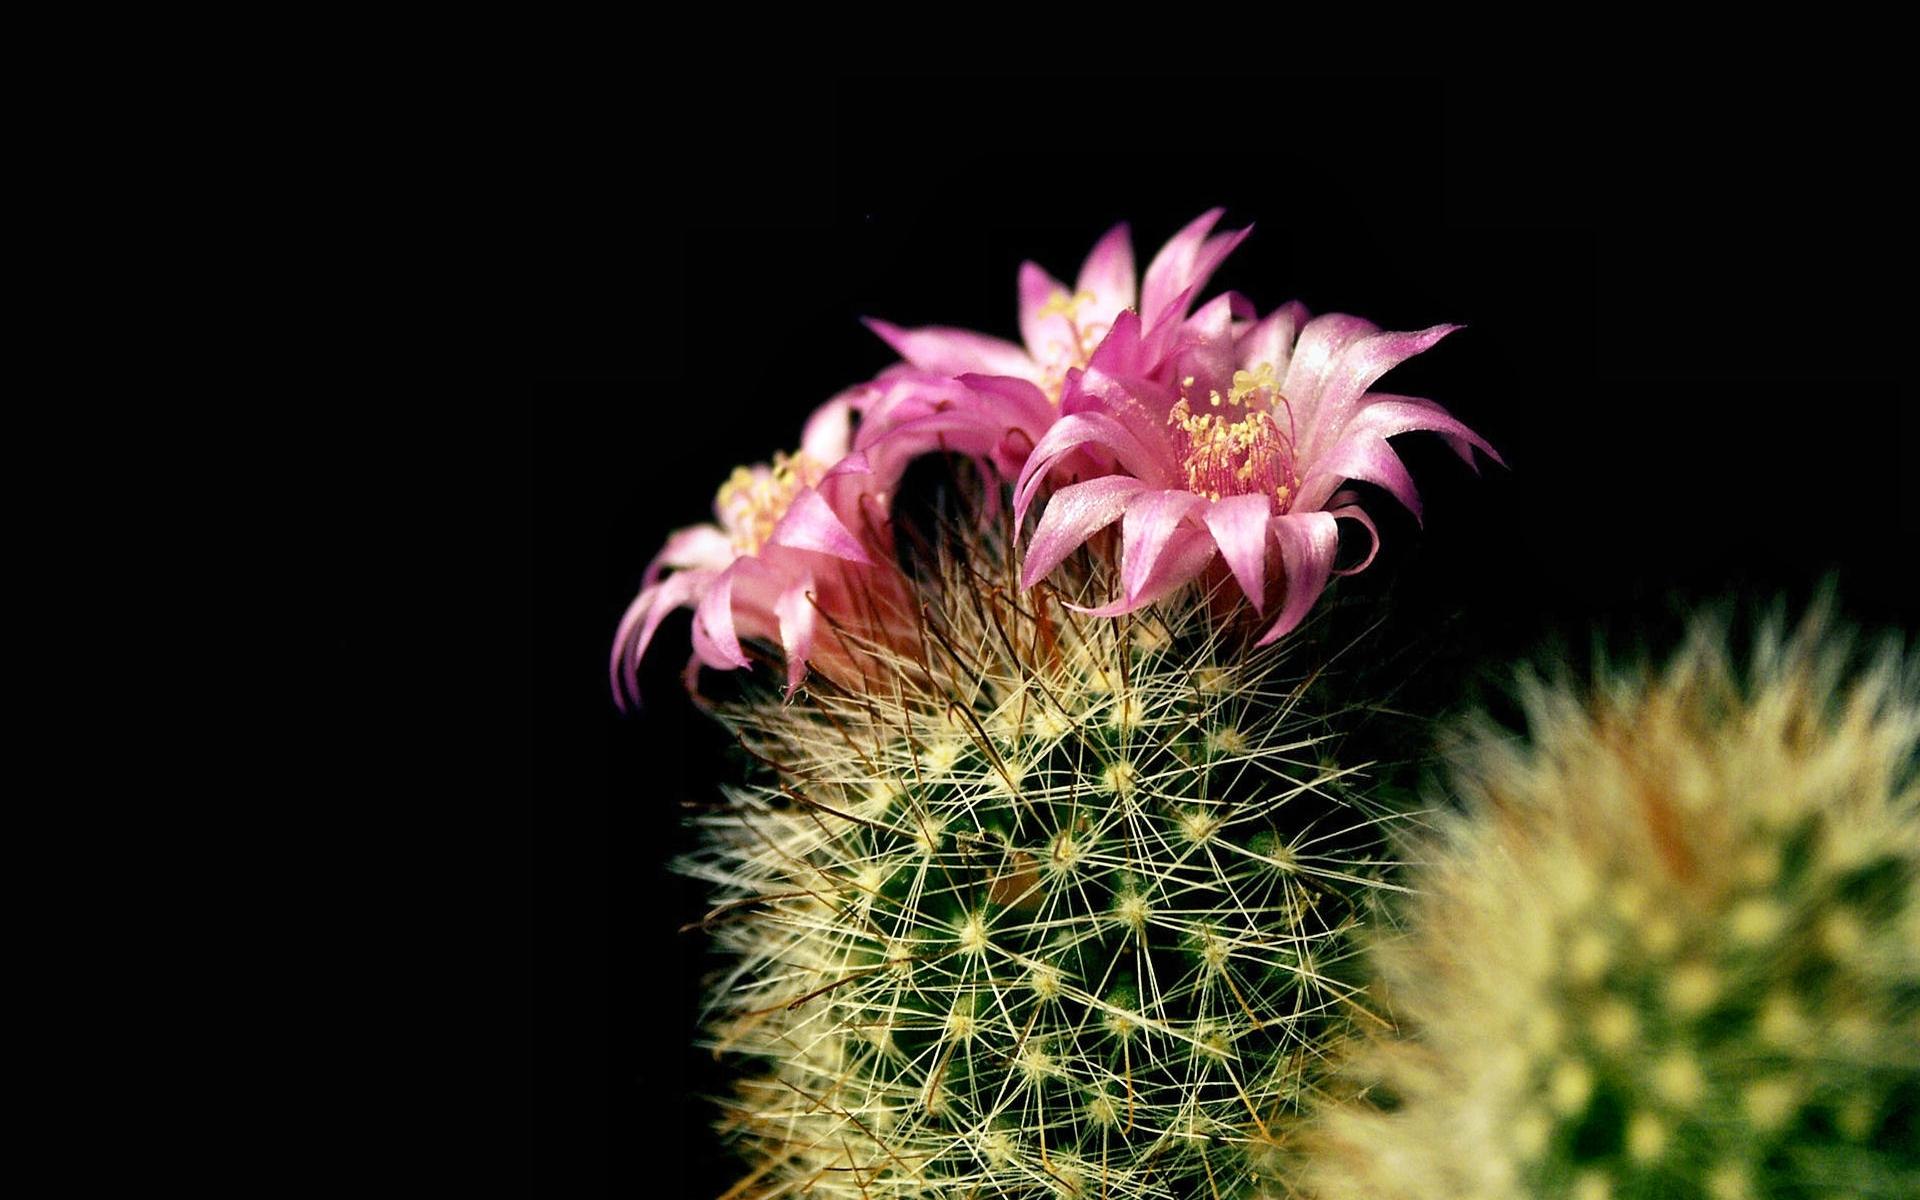 chiroyli kaktuslar